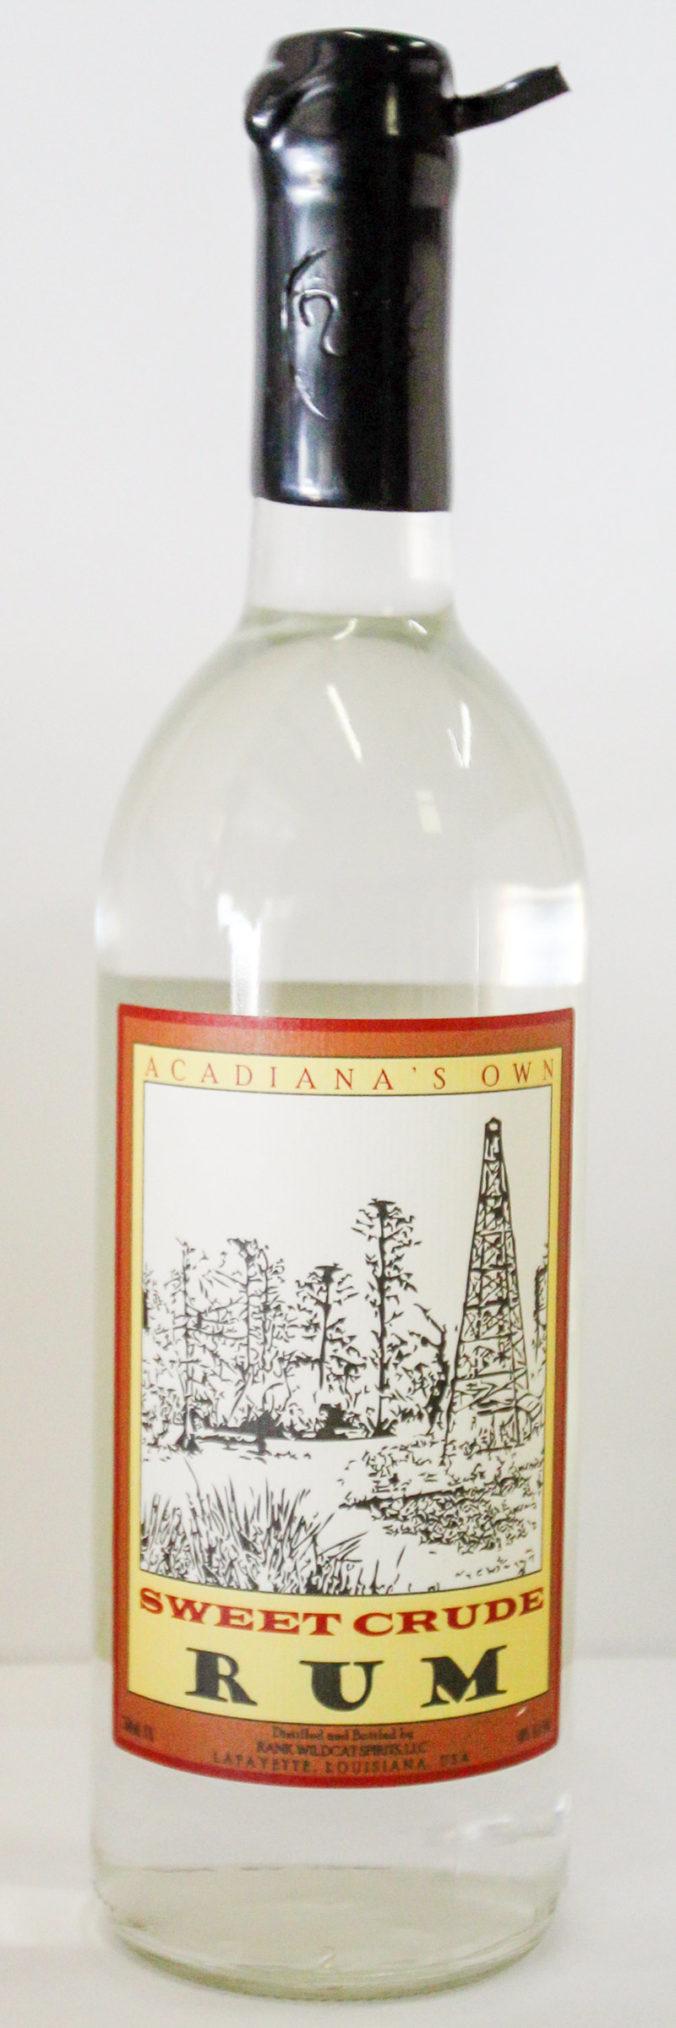 Acadiana's Own Sweet Crude Rum from Louisiana